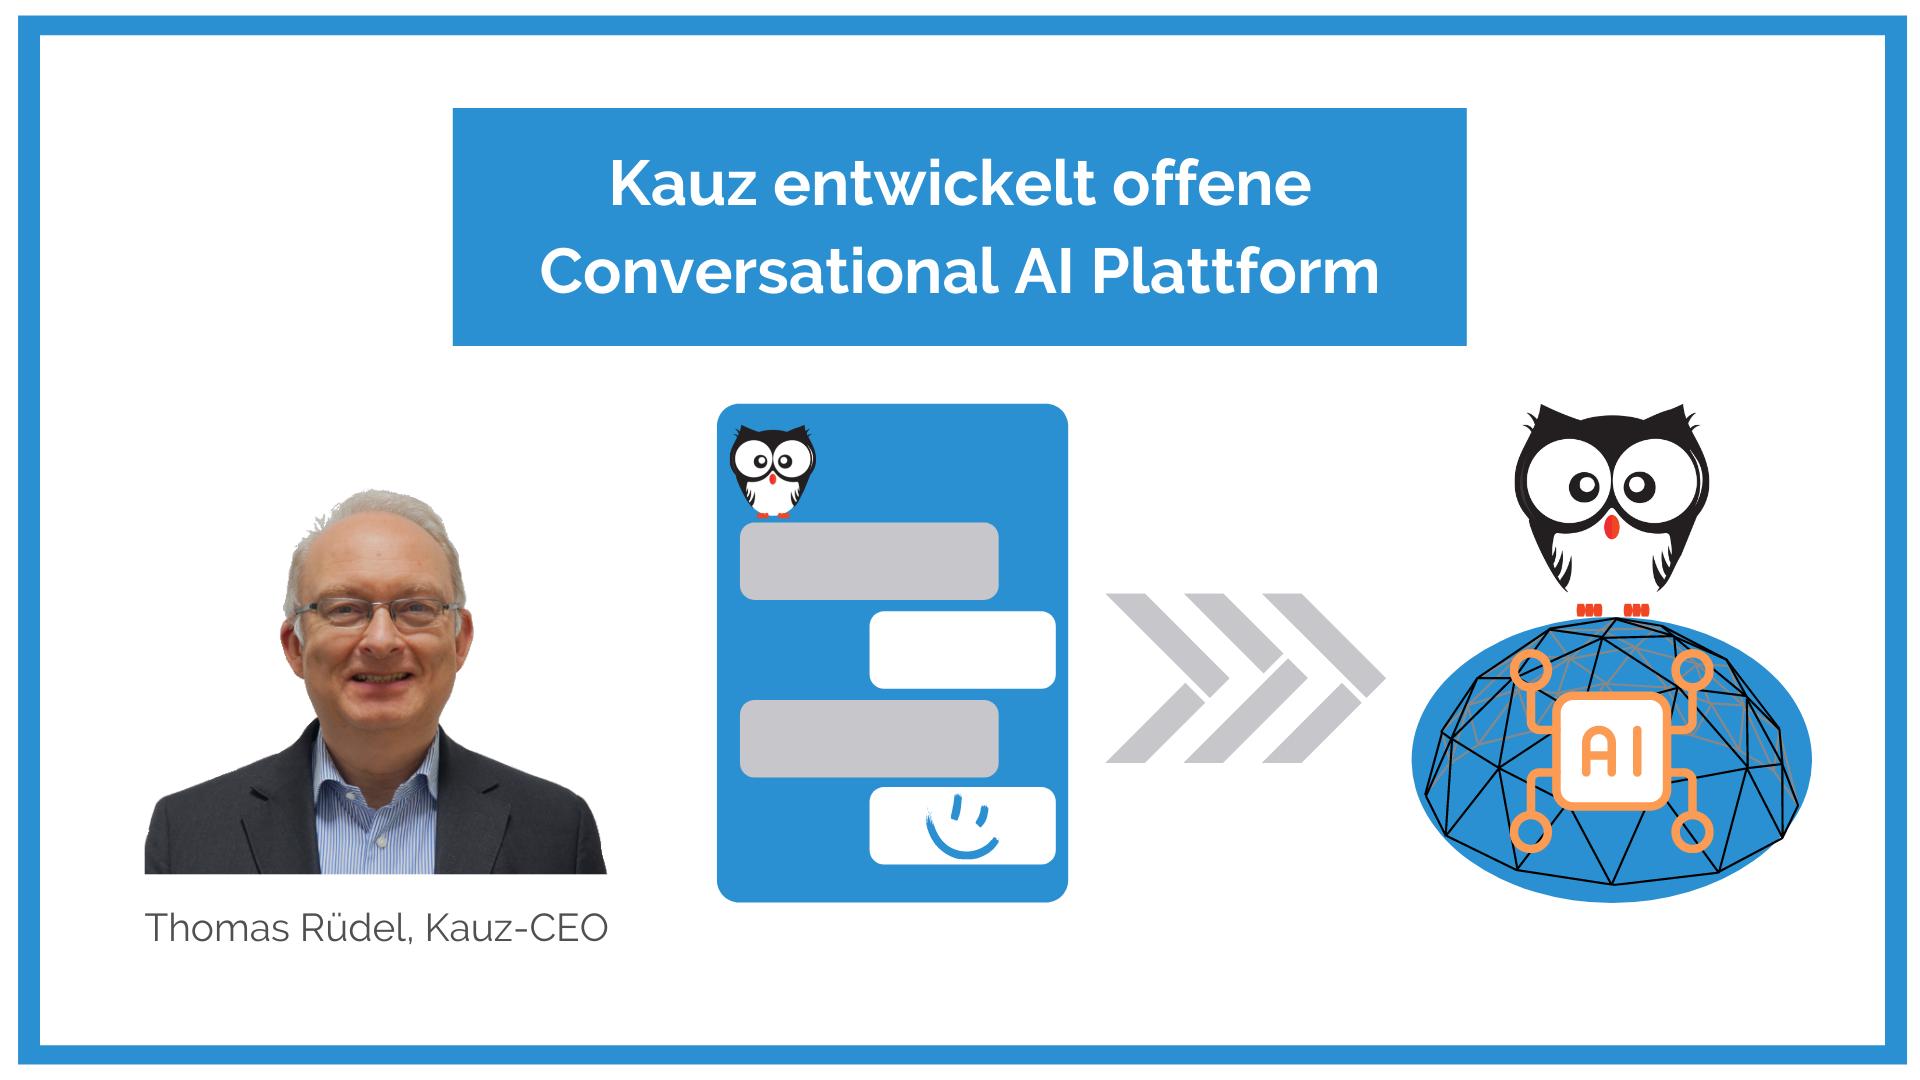 Kauz Entwickelt Offene Conversational Ai Plattform Mit Chatbots